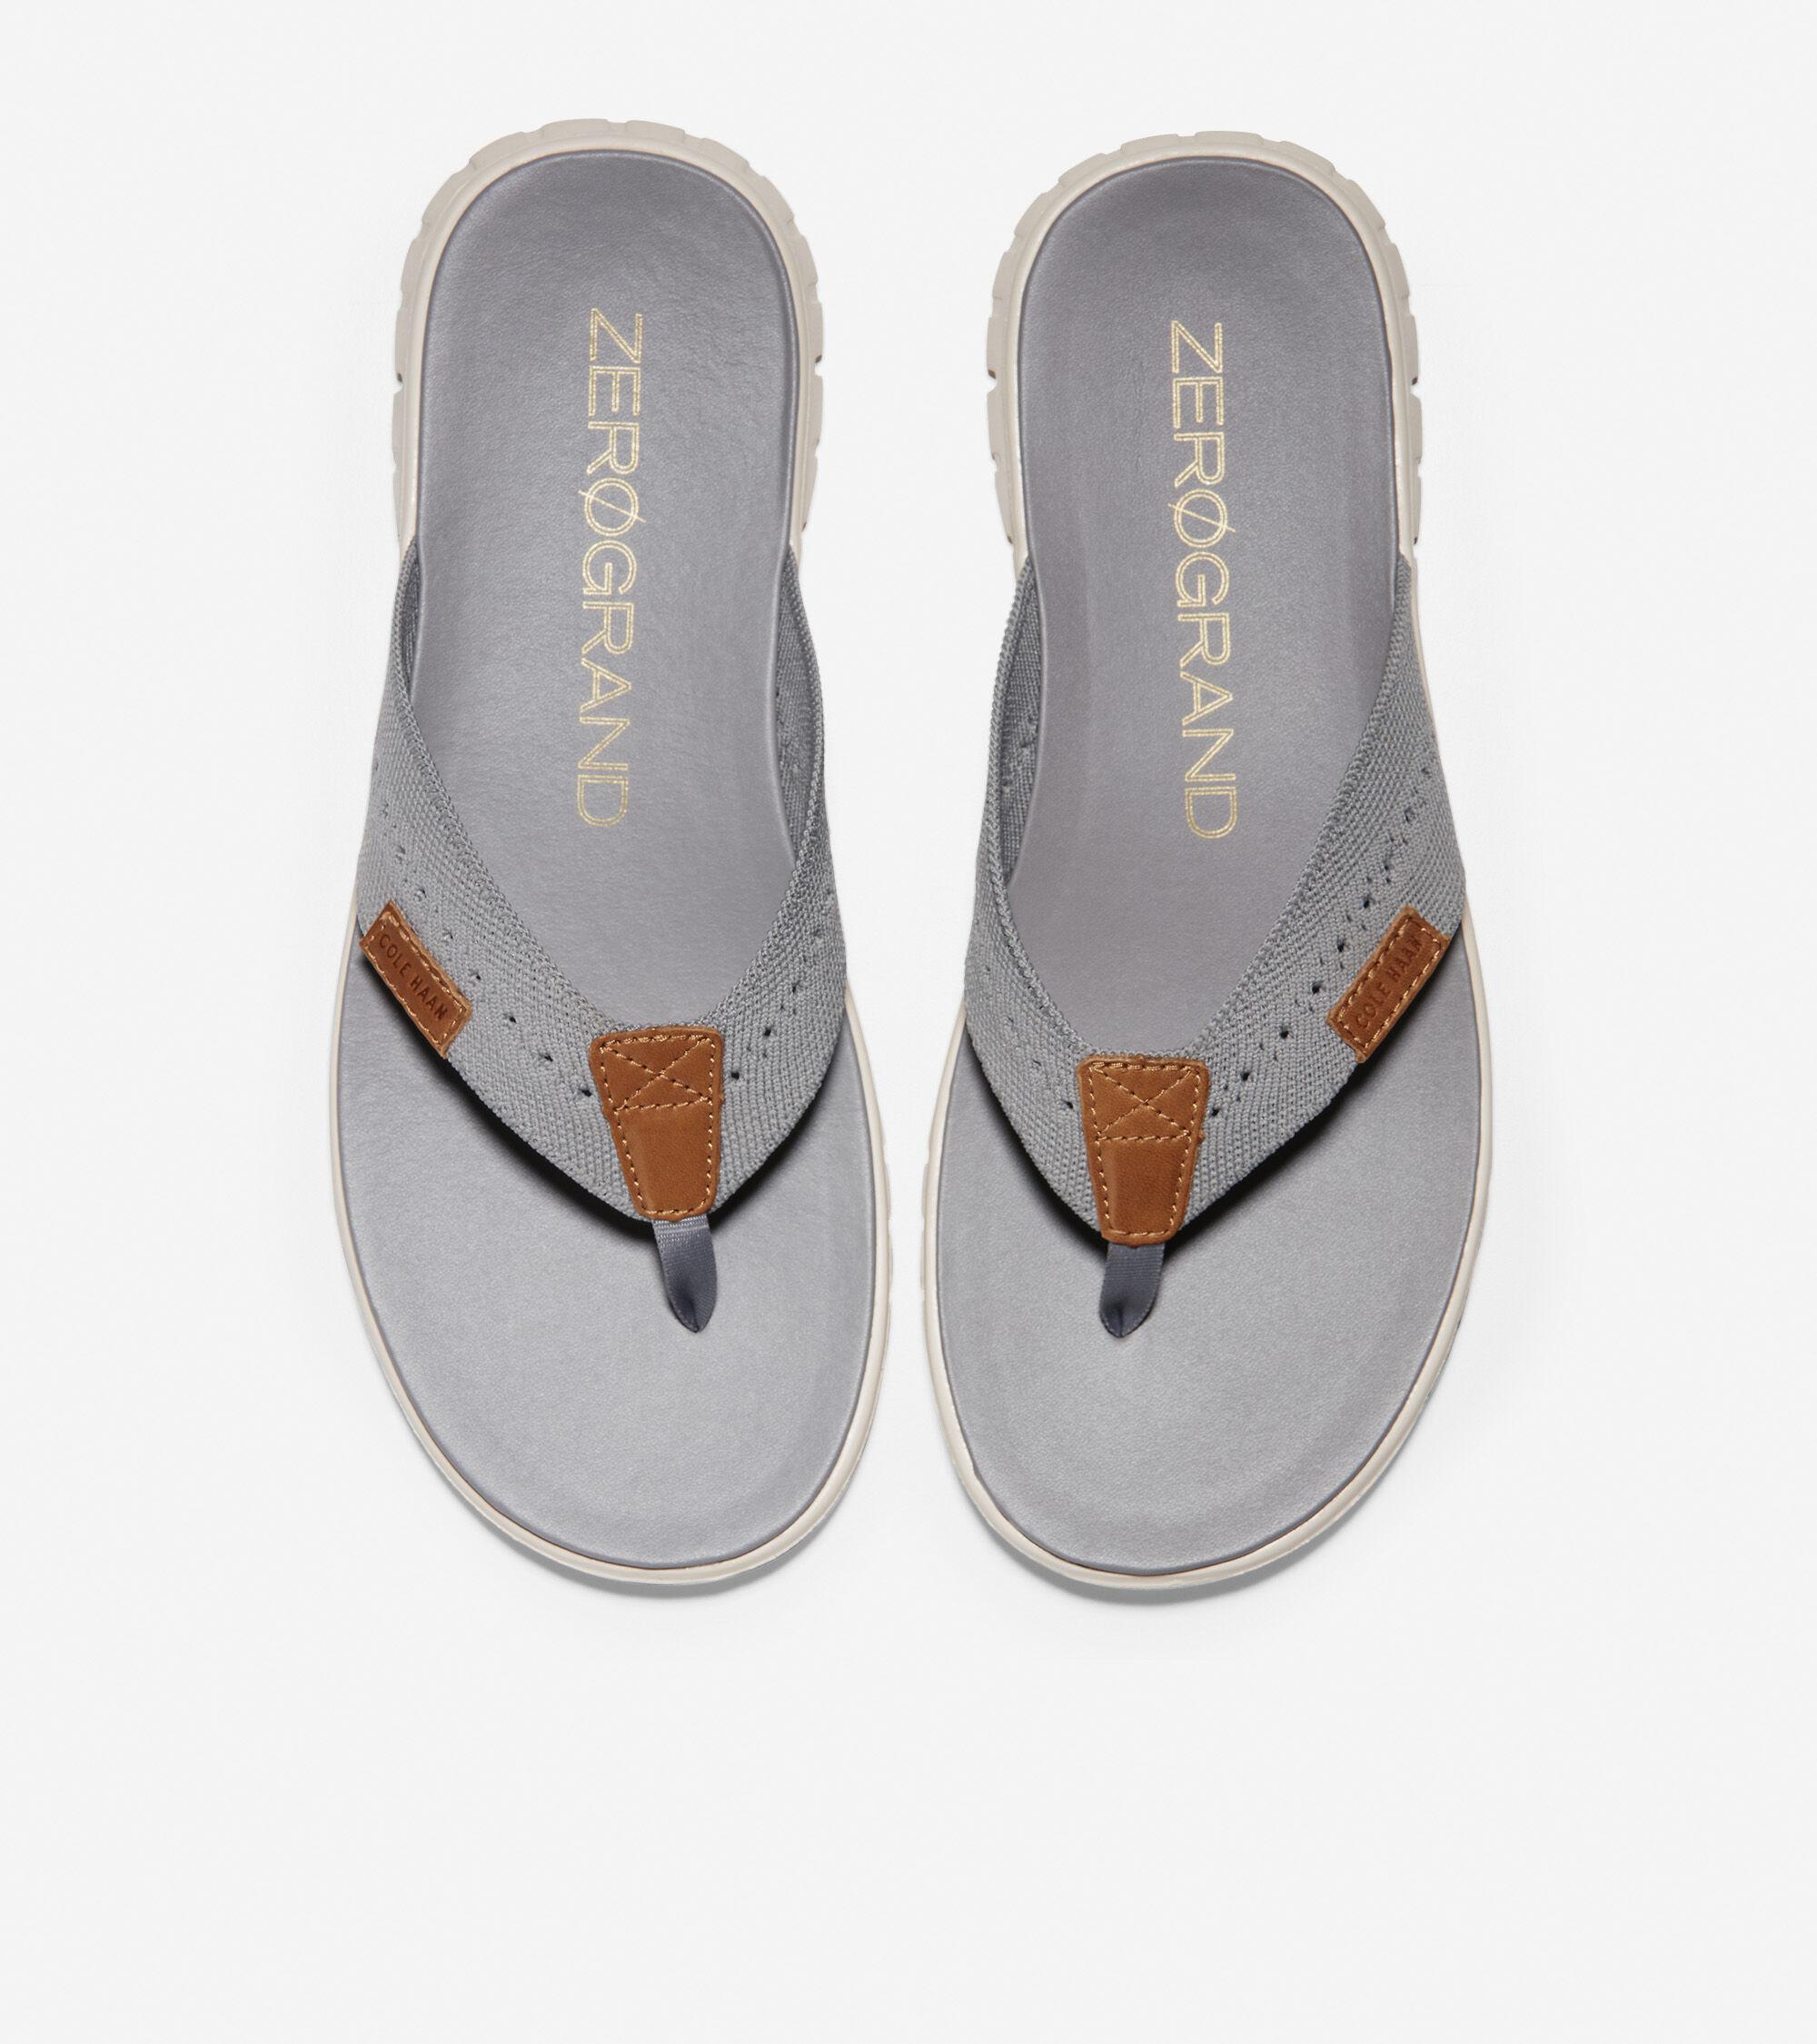 Thong Sandal in Ironstone Stitchlite